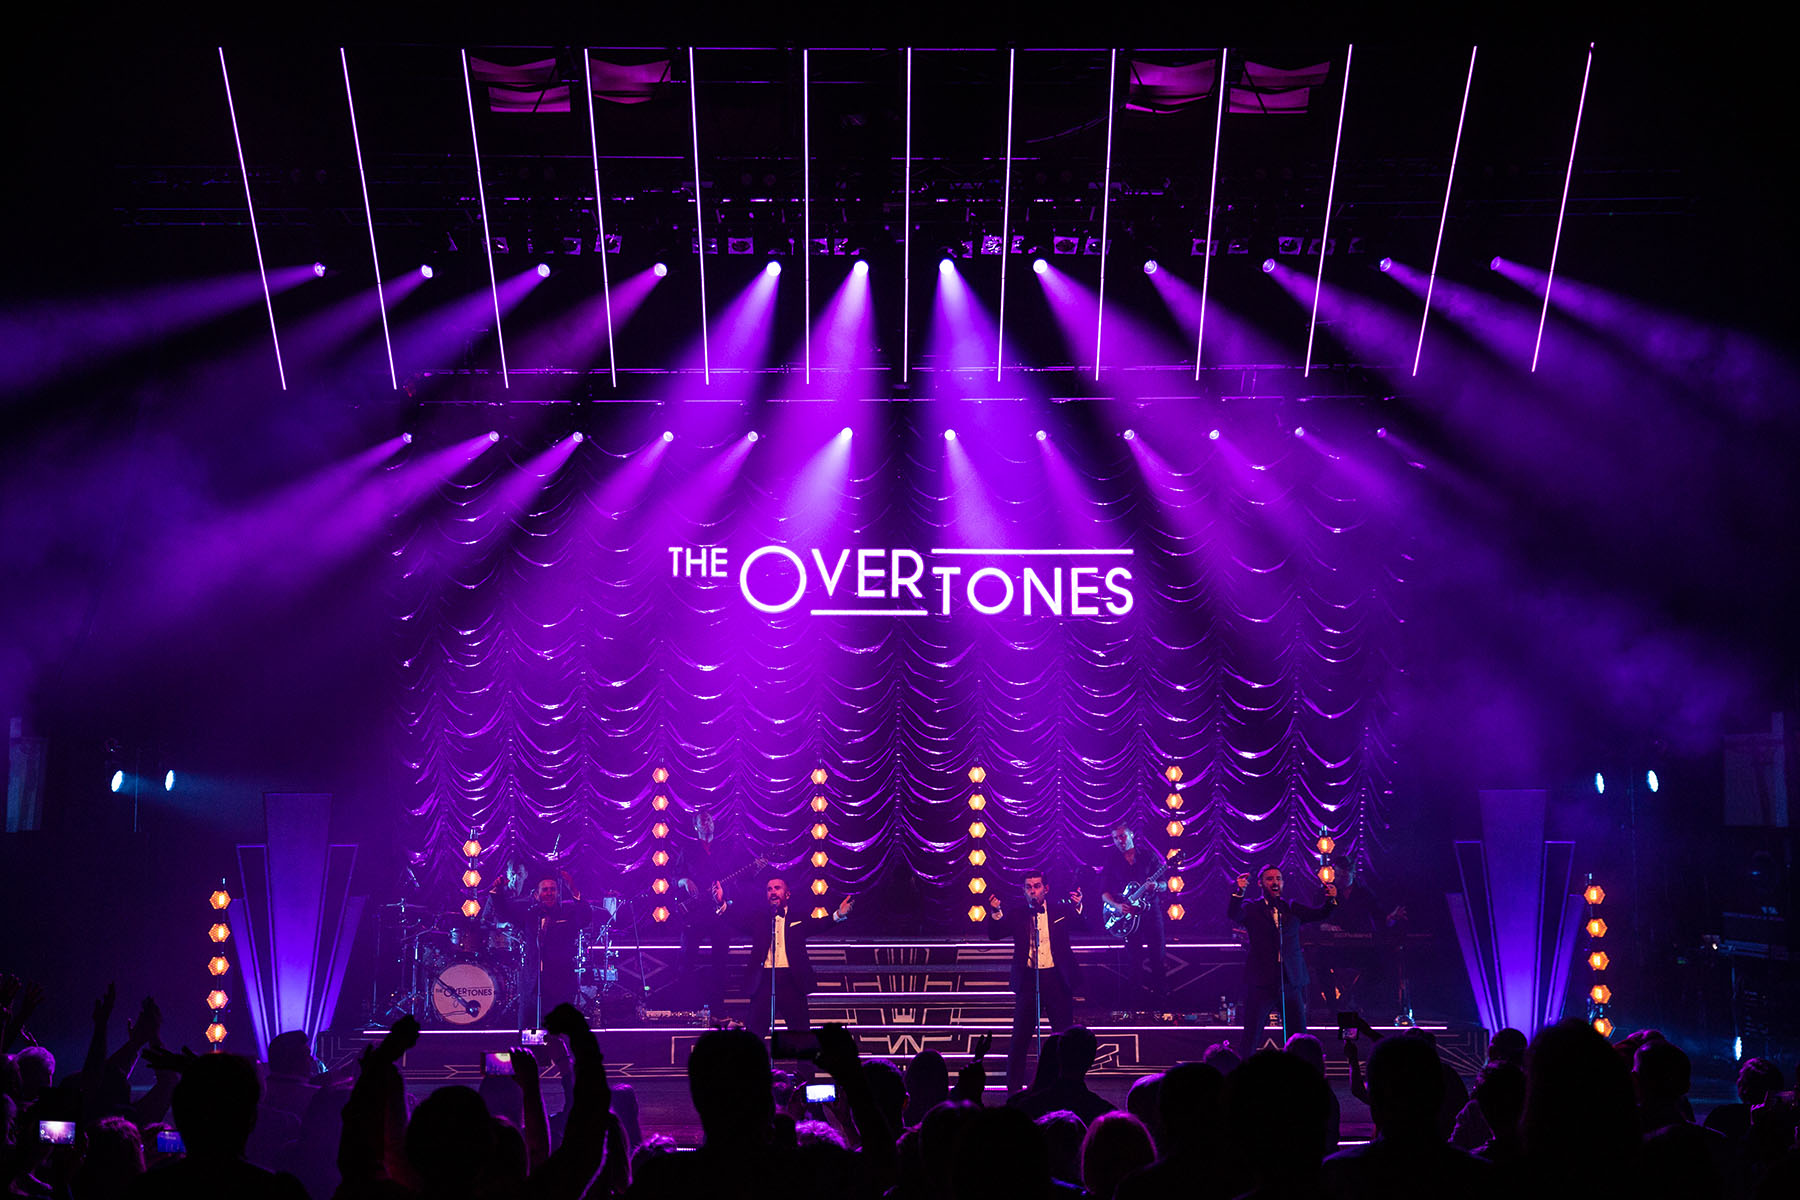 Adlib The Overtones _MG_5027.jpg